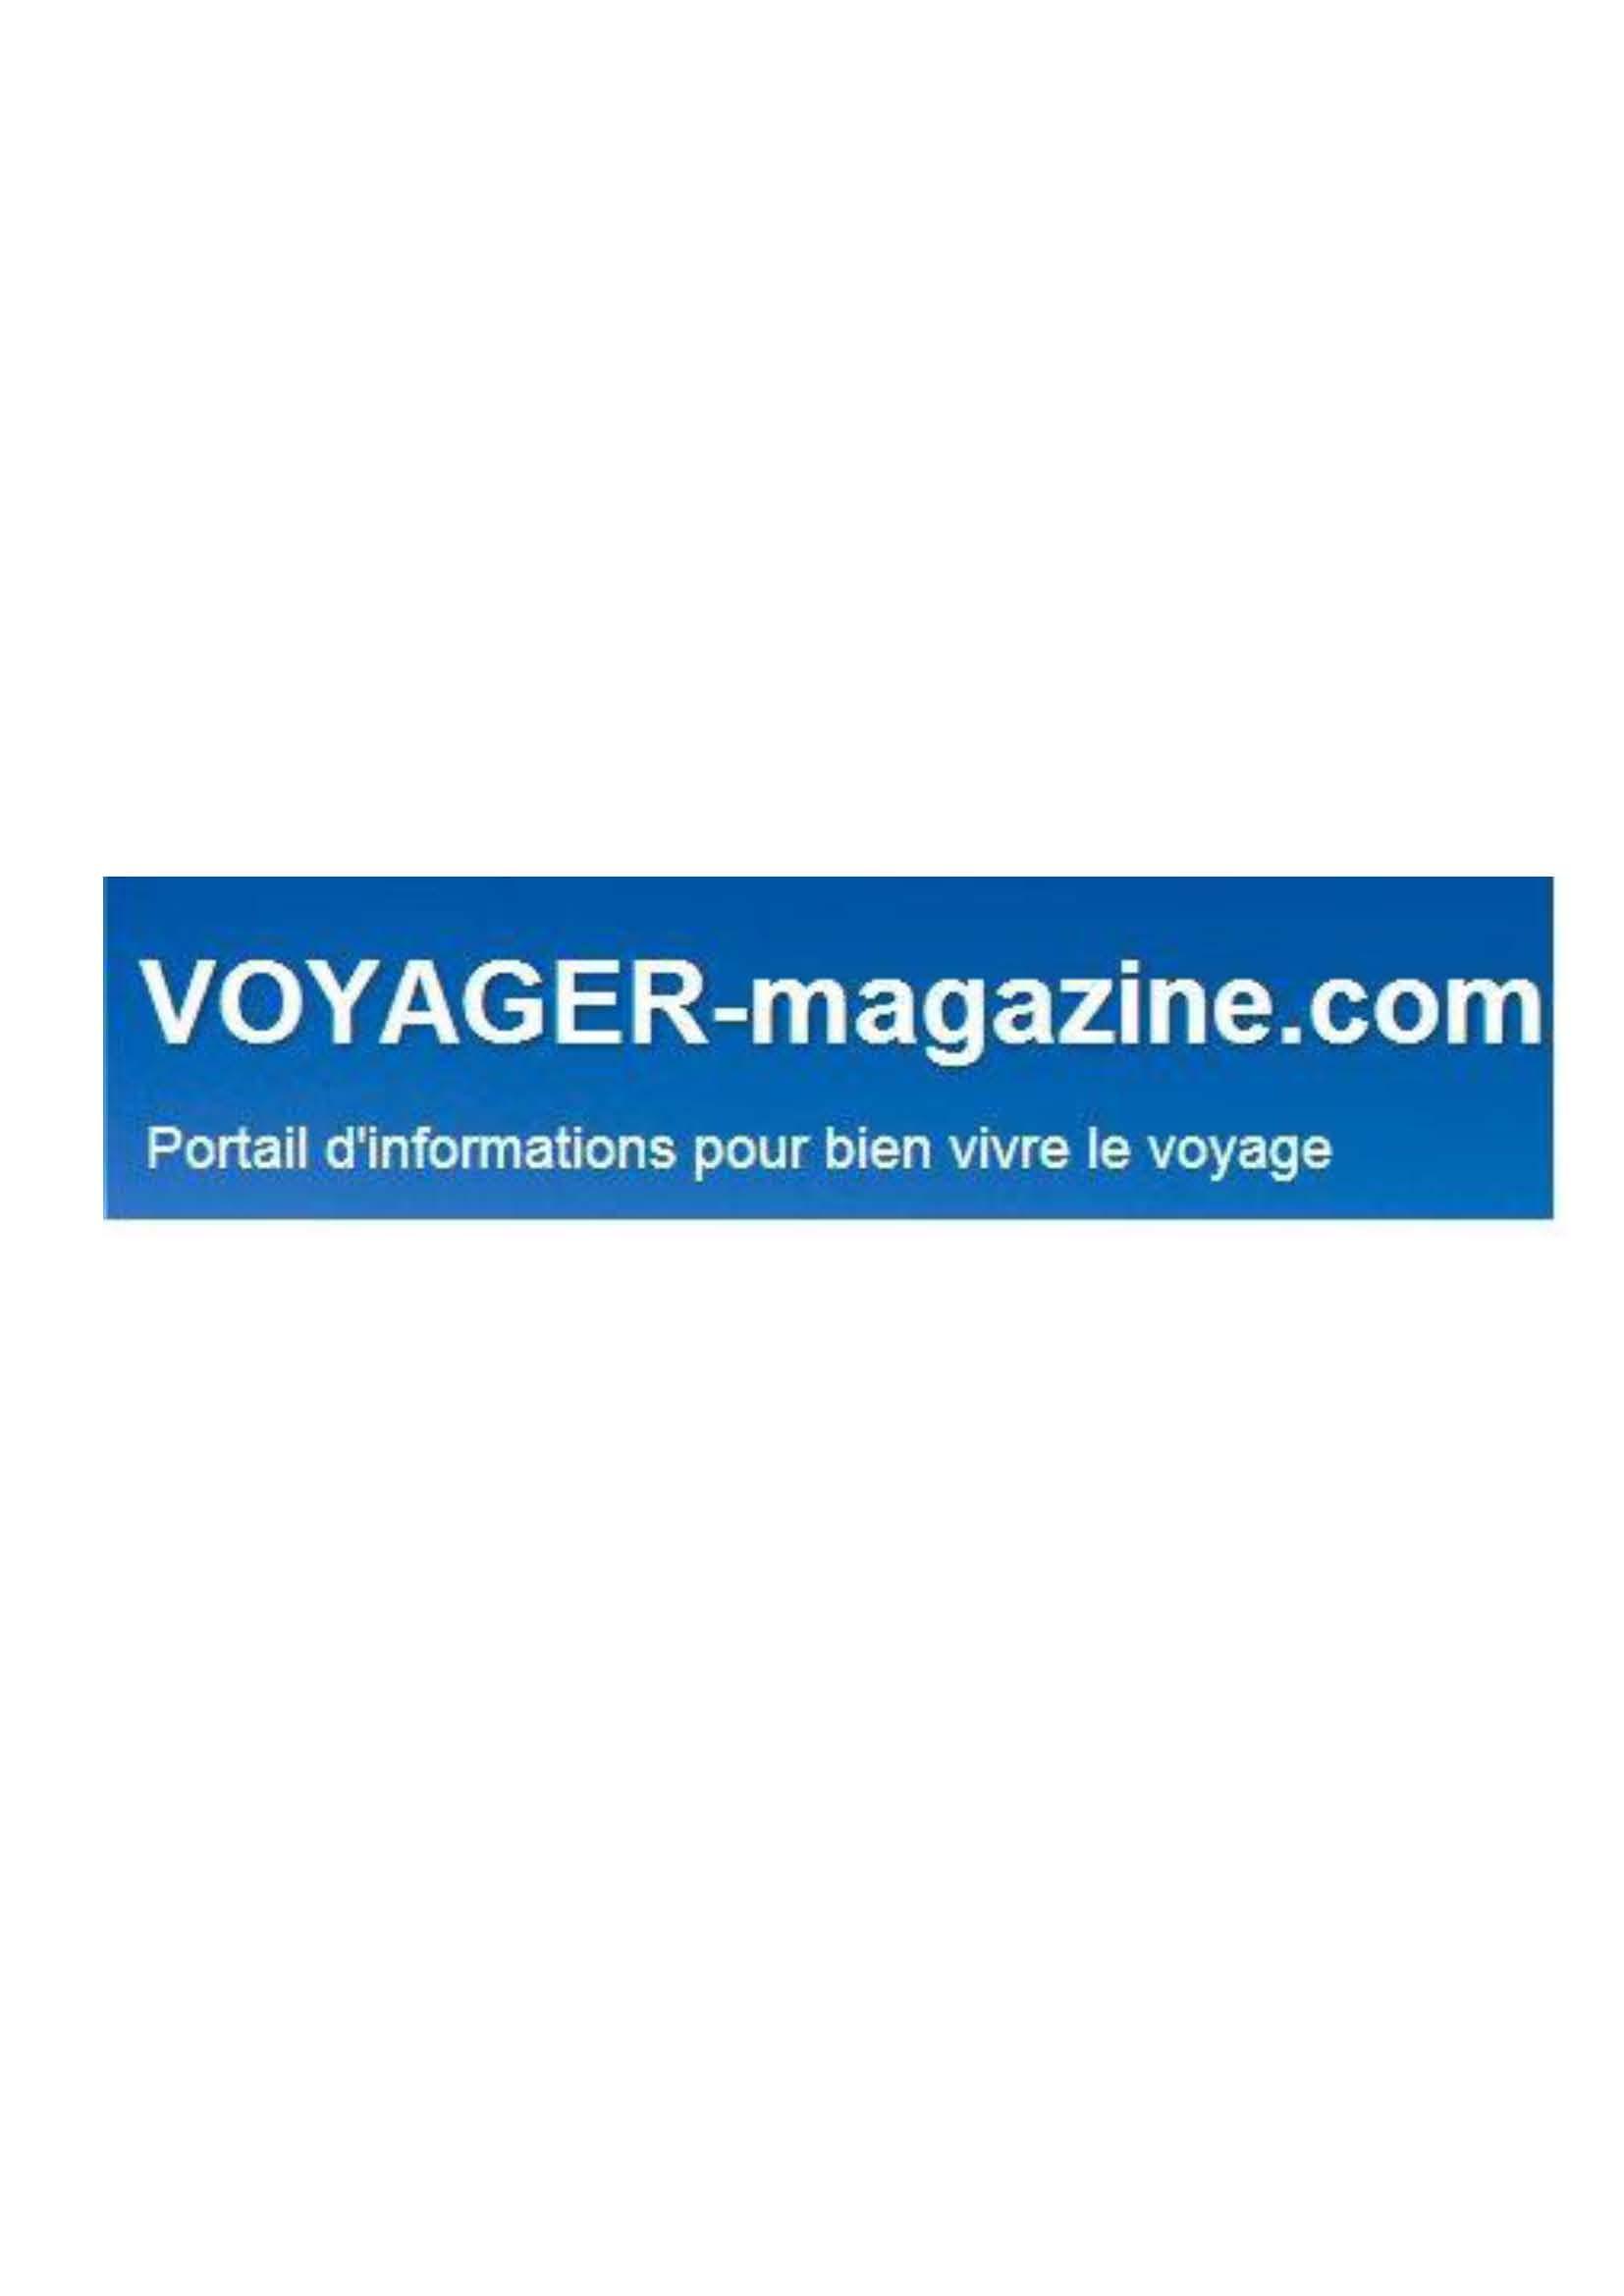 service magazine esprit libre